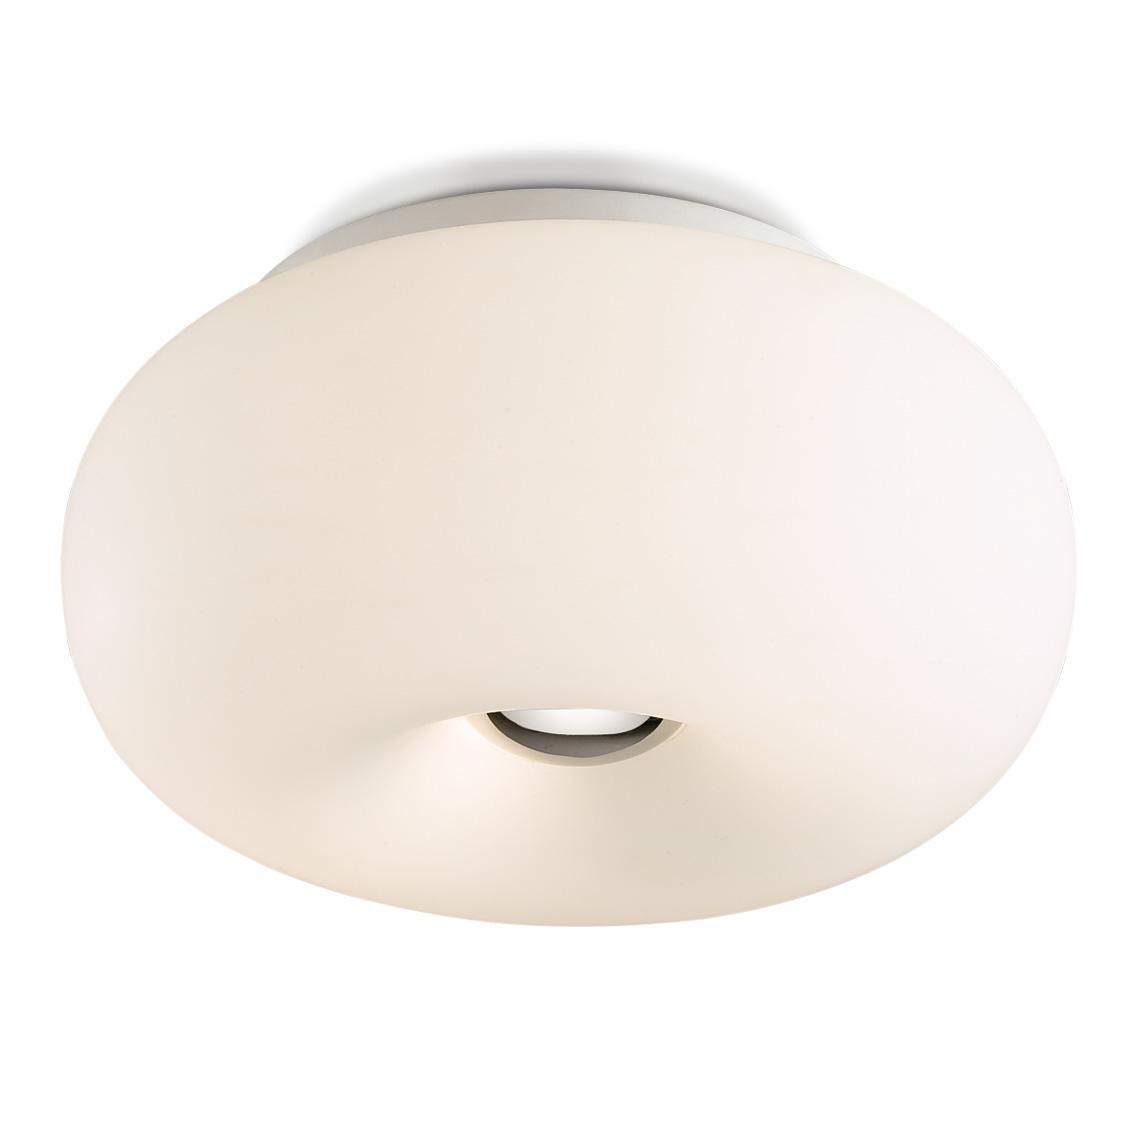 Потолочный светильник Odeon Light Pati 2205/2C цены онлайн